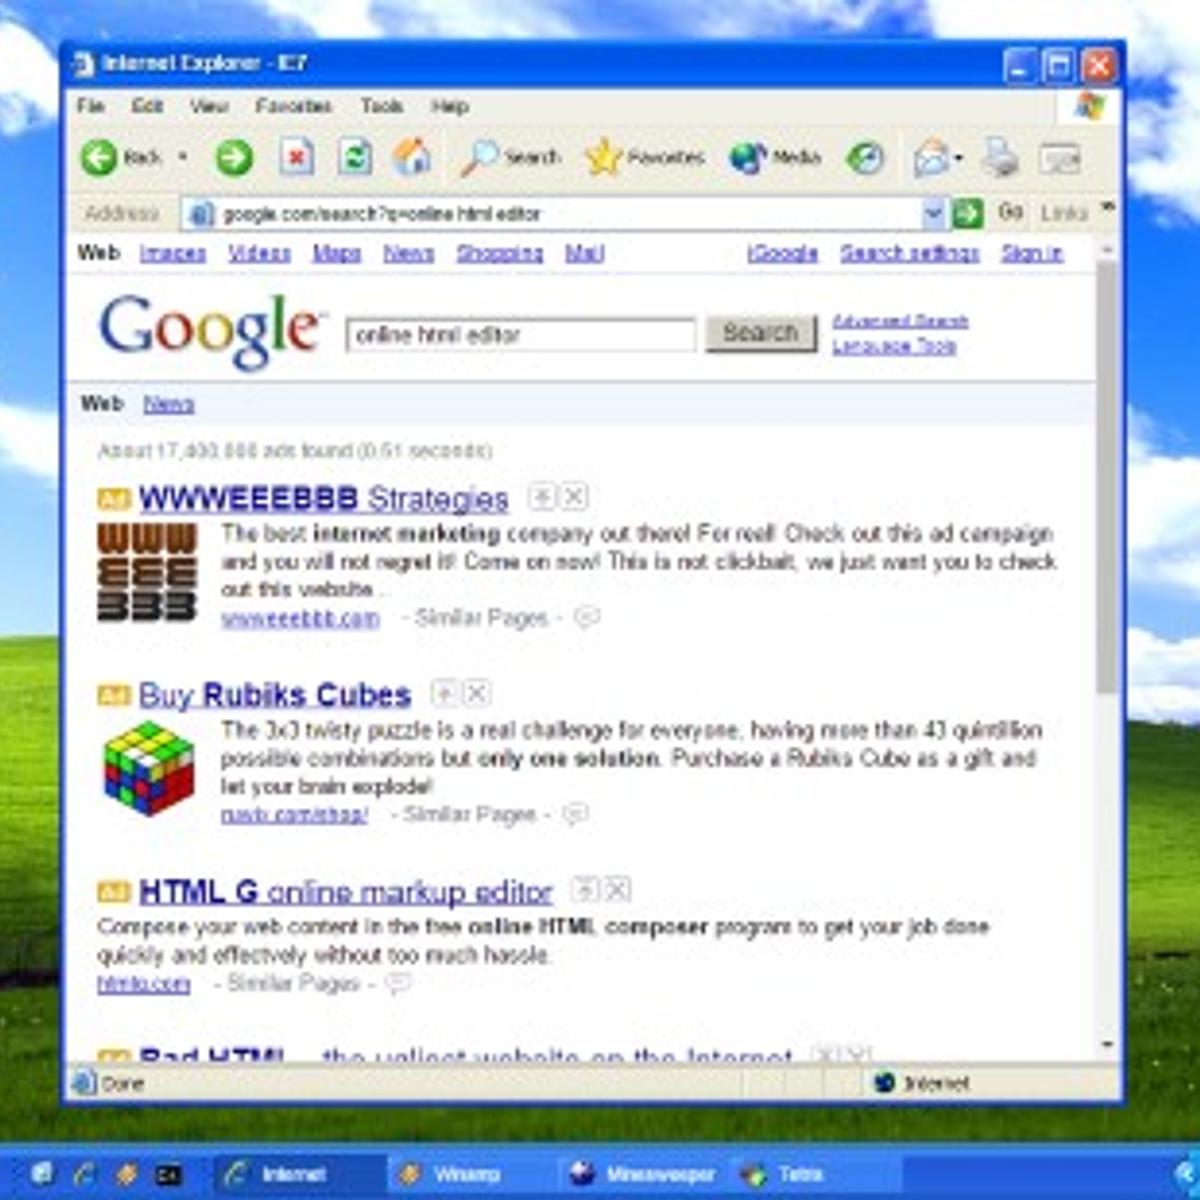 GeekPrank com Alternatives and Similar Websites and Apps